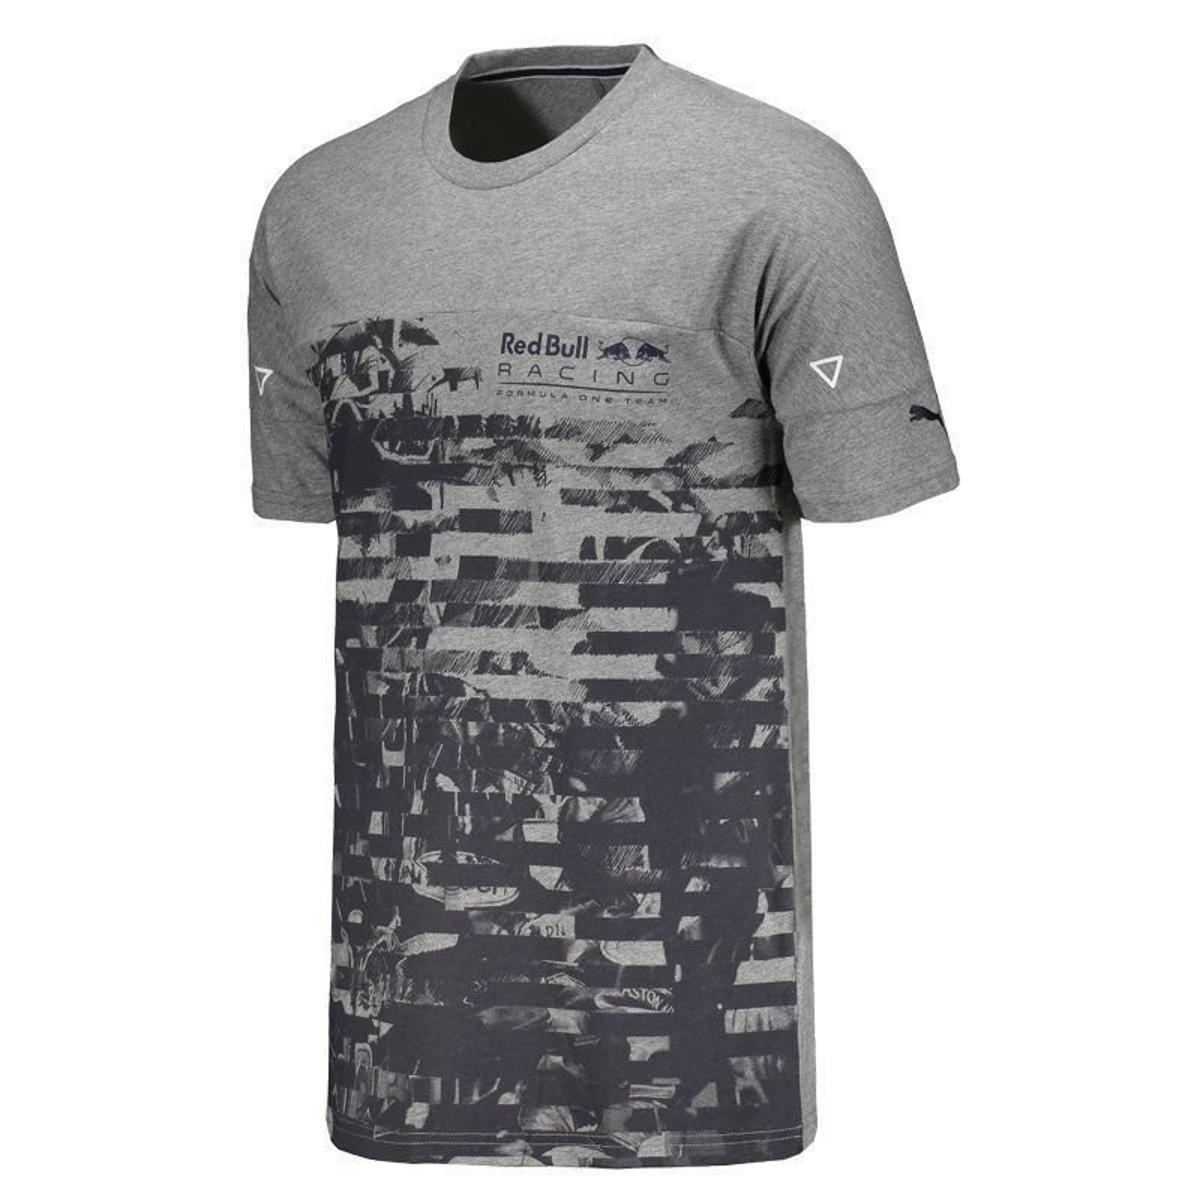 822def11b2 Camiseta Puma Red Bull Racing Life Graphic Masculina - Compre Agora ...